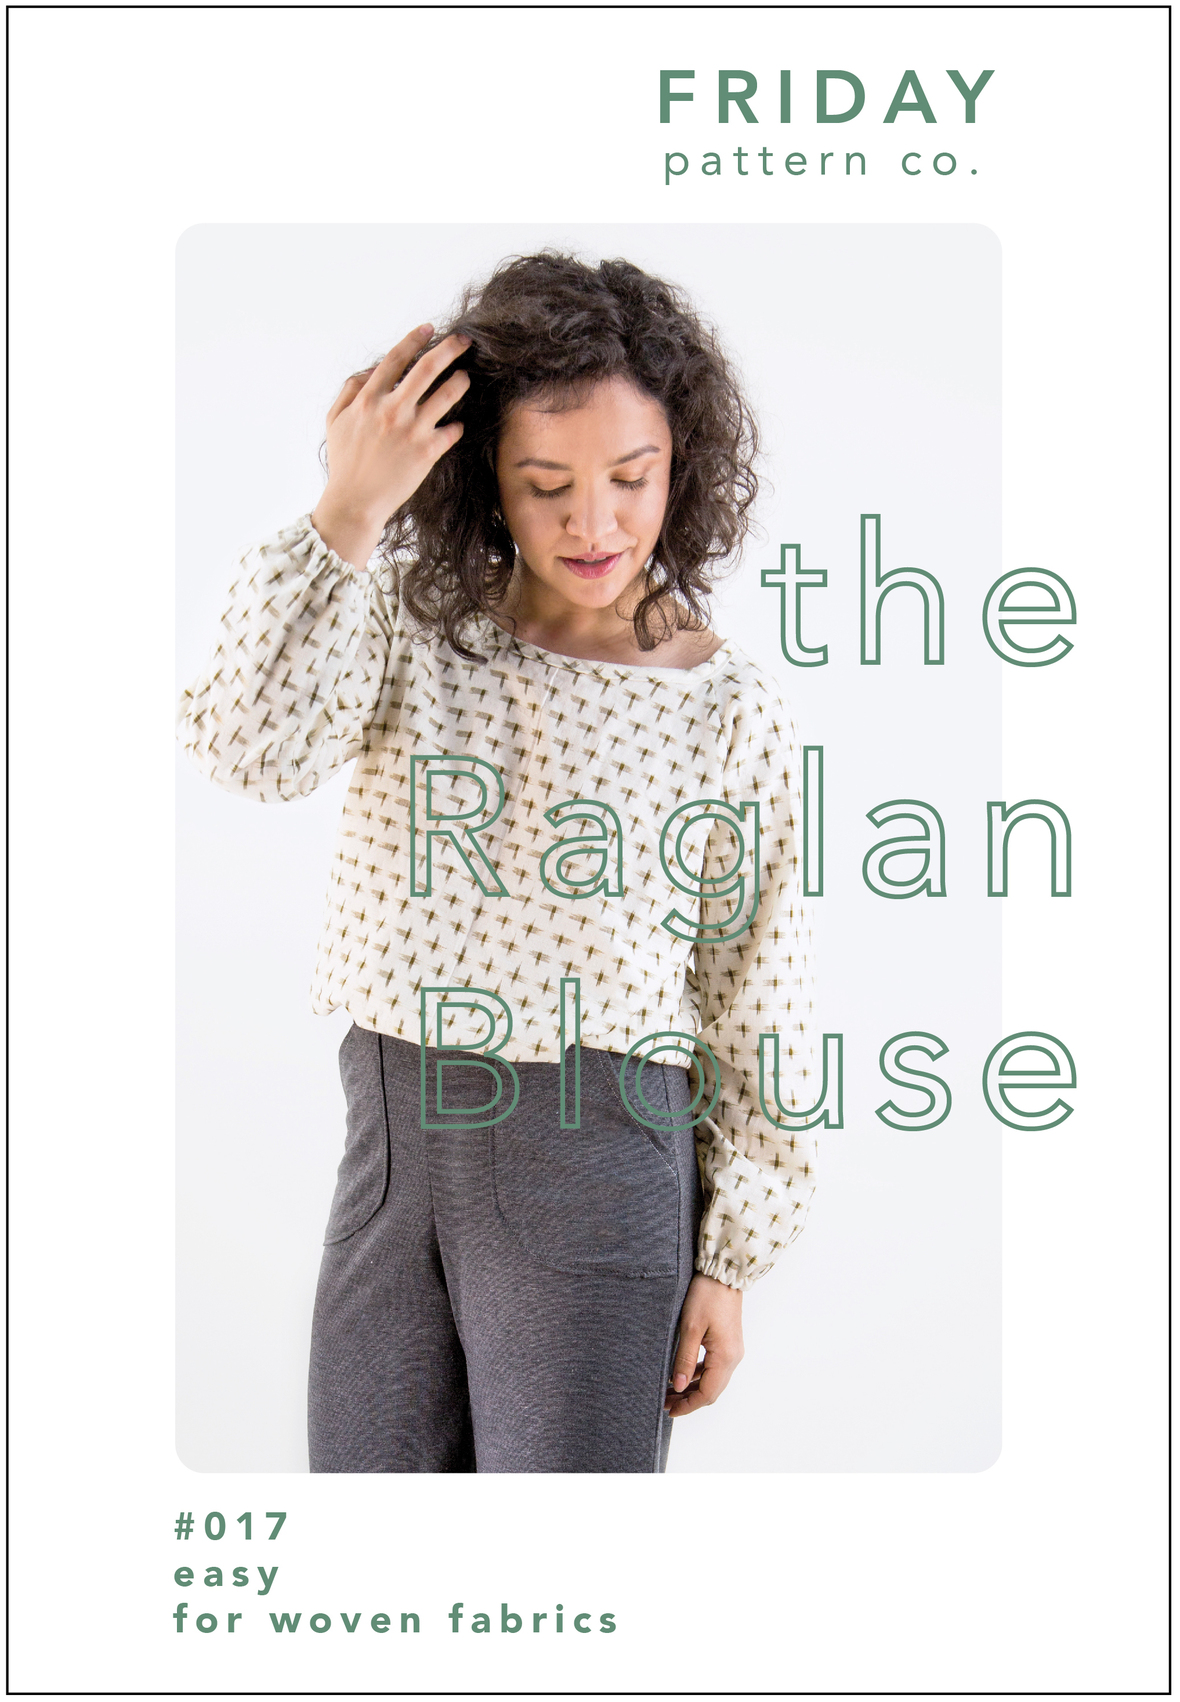 Raglan Blouse Front